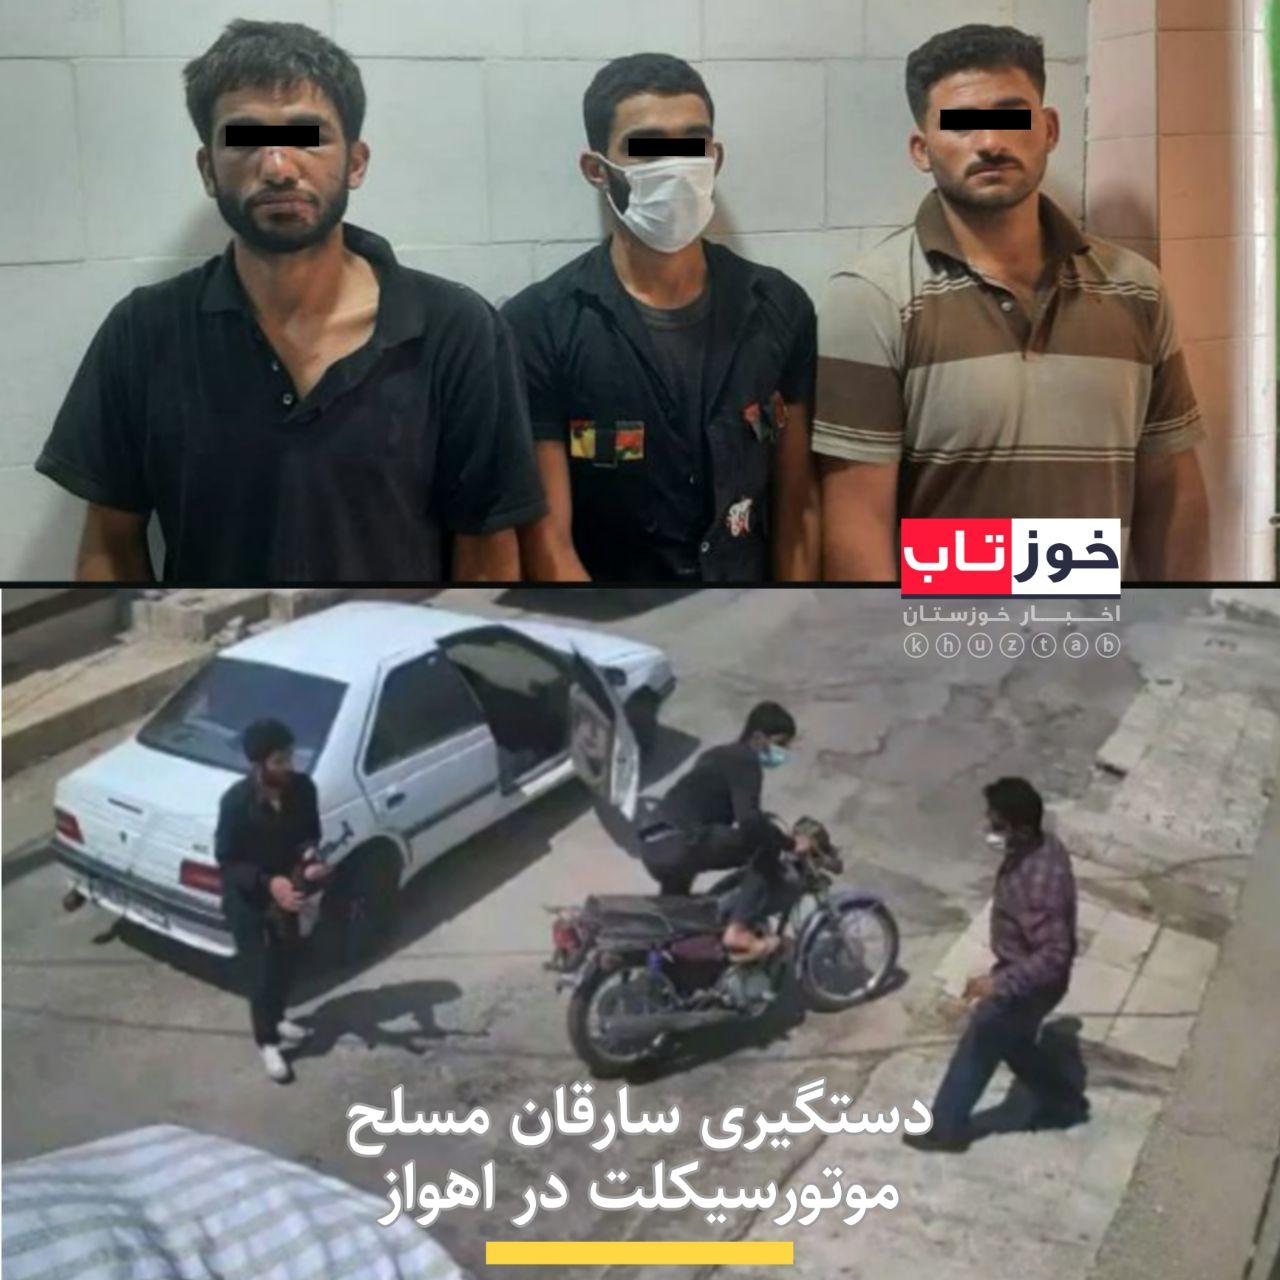 IMG 20210901 134115 179 دستگیری سارقان مسلح موتورسیکلت اهواز در کمتر از 48 ساعت